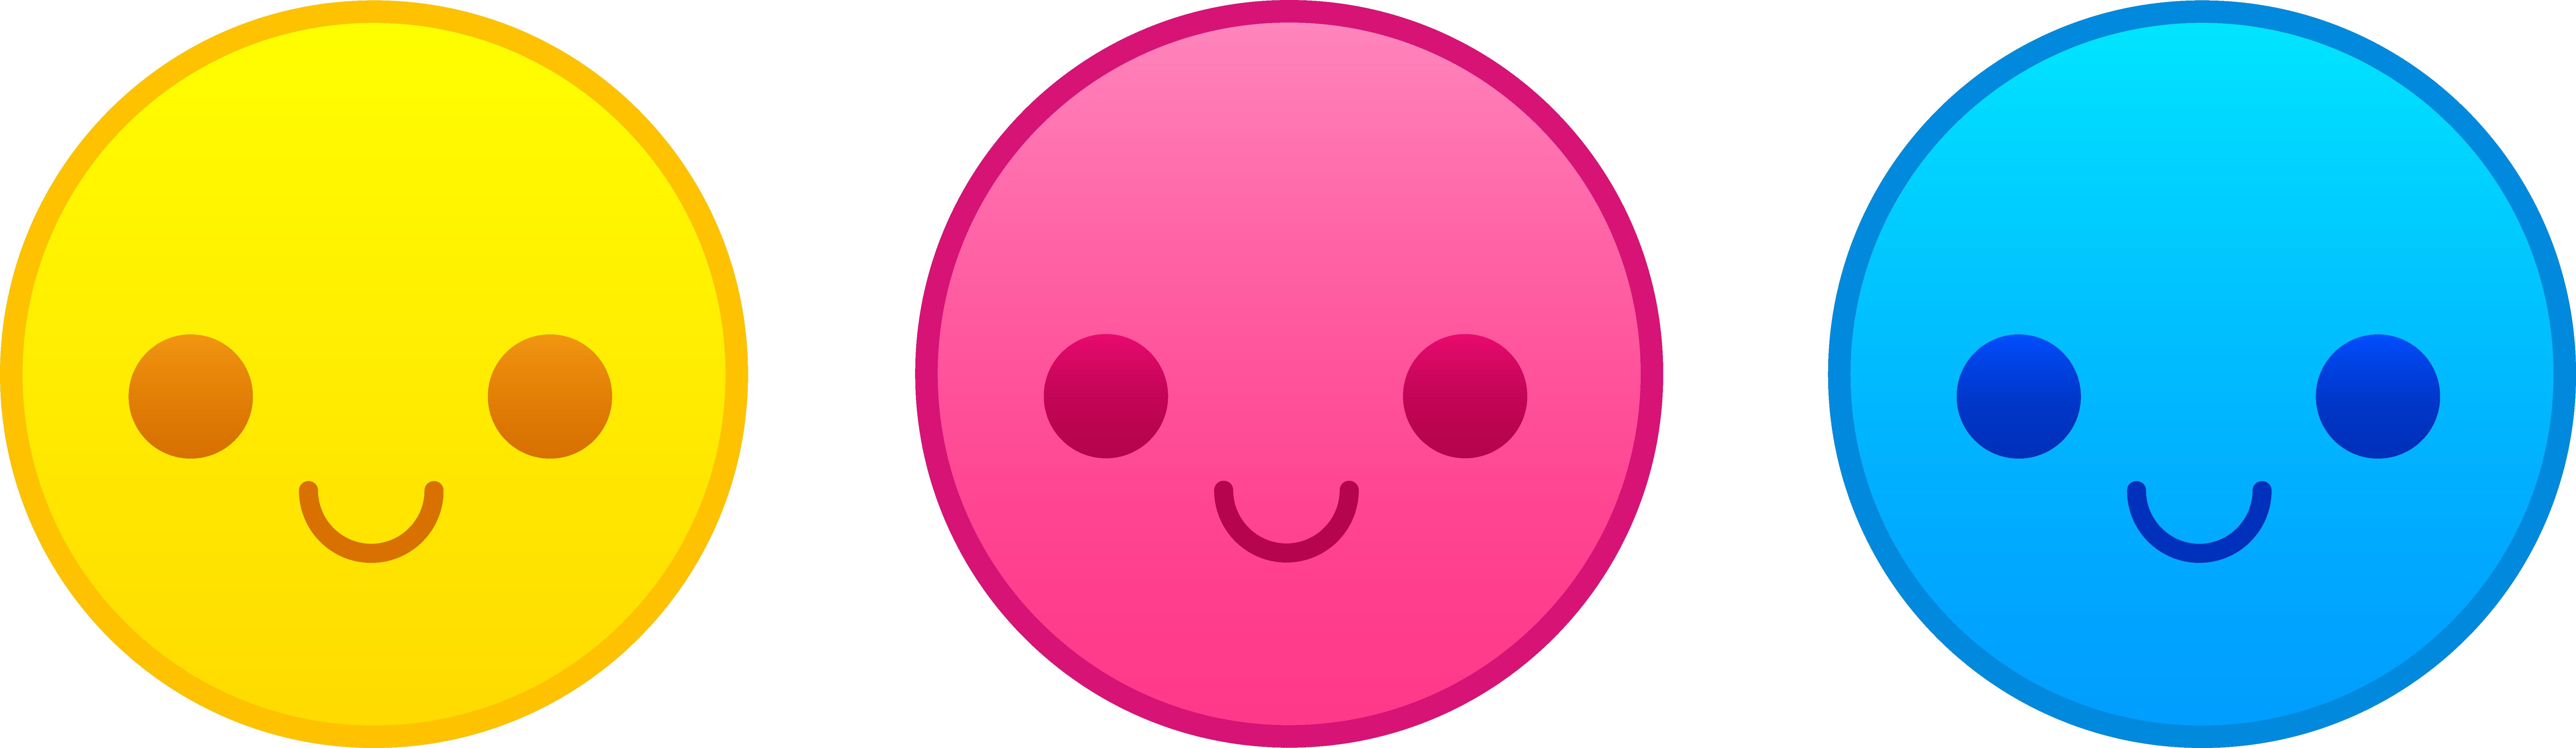 Cute smiley faces clipart png transparent Sad Cartoon Faces Clipart | Free download best Sad Cartoon Faces ... png transparent